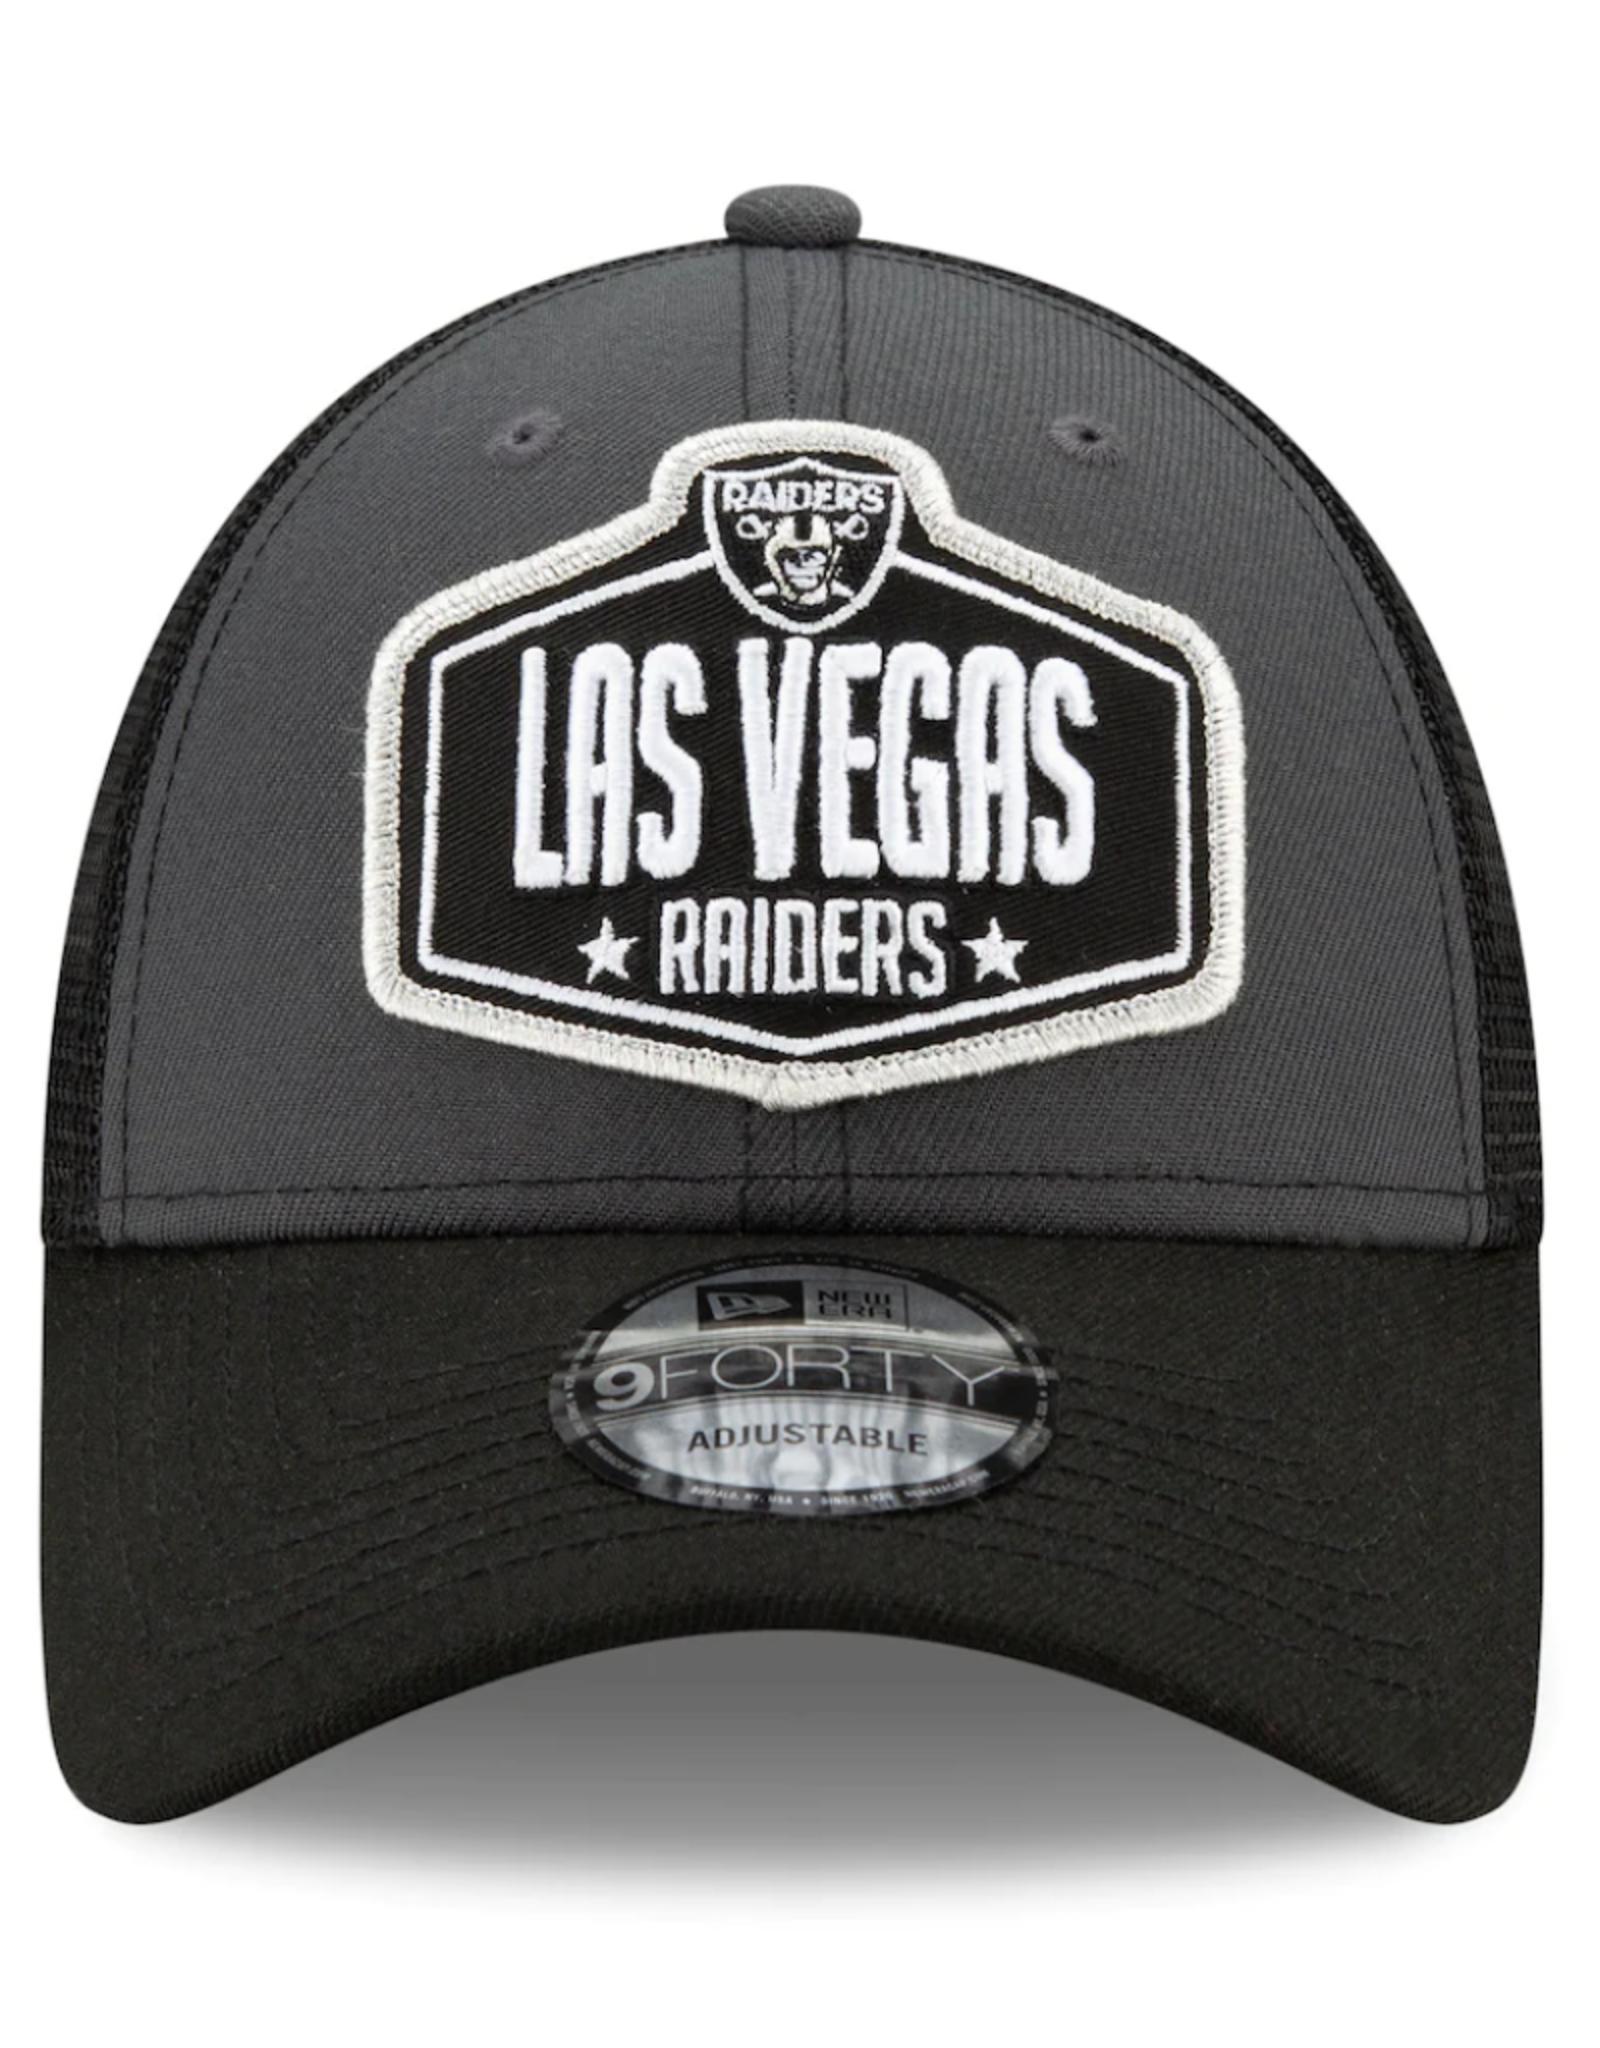 New Era Men's '21 9FORTY Adjustable NFL Draft Hat Las Vegas Raiders